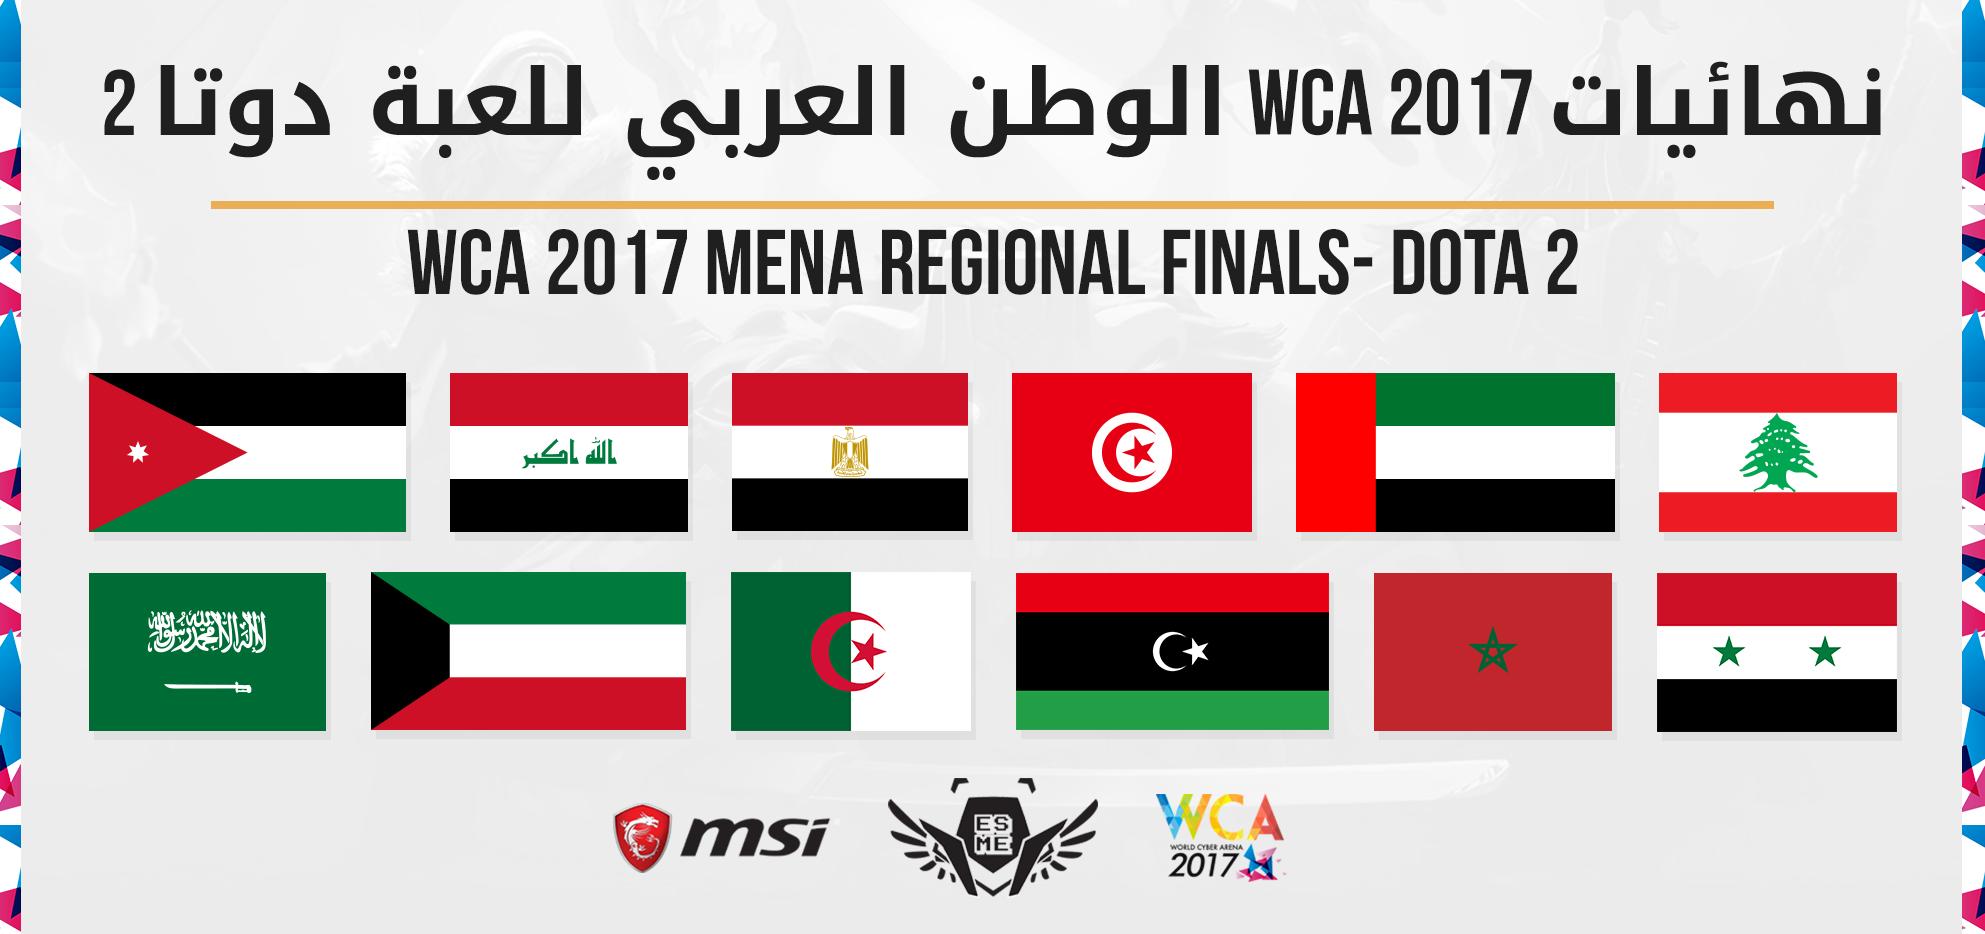 Photo of تحديد هوية أول الواصلين لنهائي WCA 2017 Dota 2 الوطن العربي والمنافسة تصل لمرحلتها الأخيرة